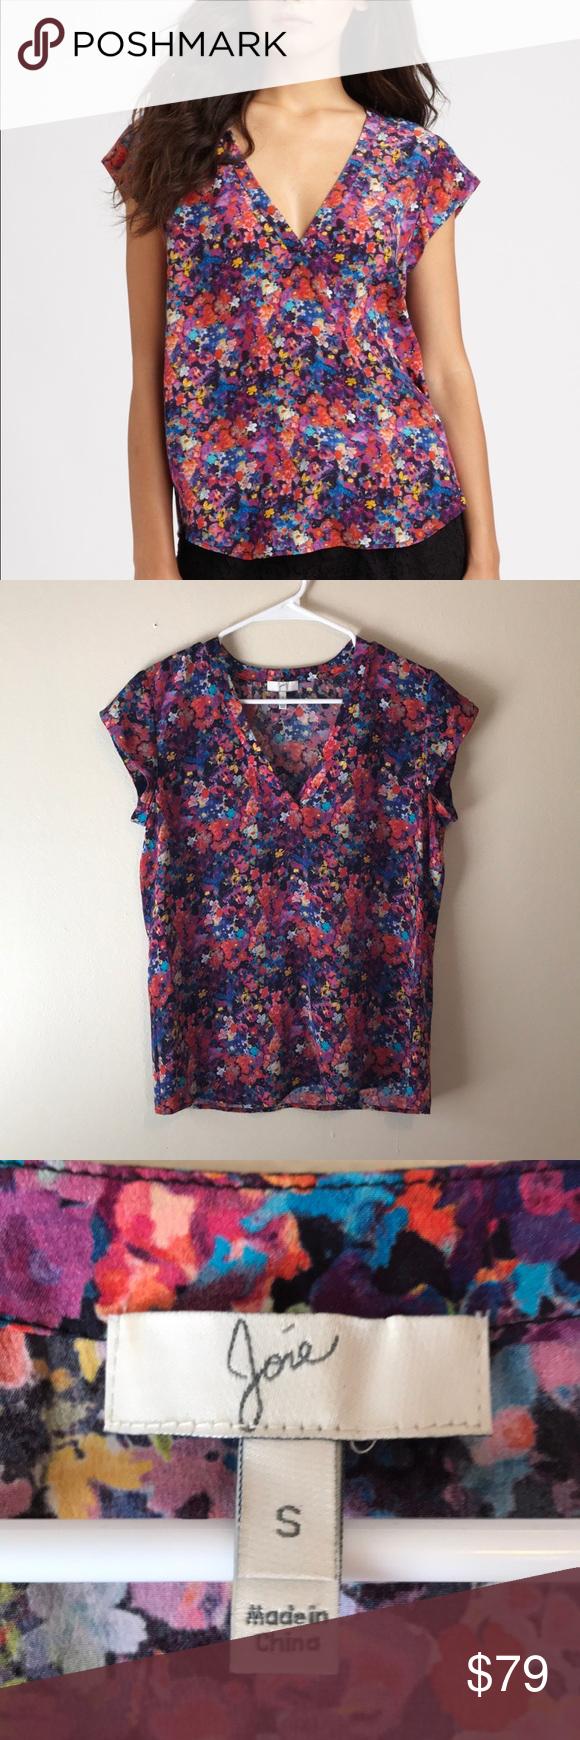 e51d20e17eb827 Joie Floral Silk Short Sleeve Blouse Joie Rubina Silk Top. Floral indigo  print. V-neck style